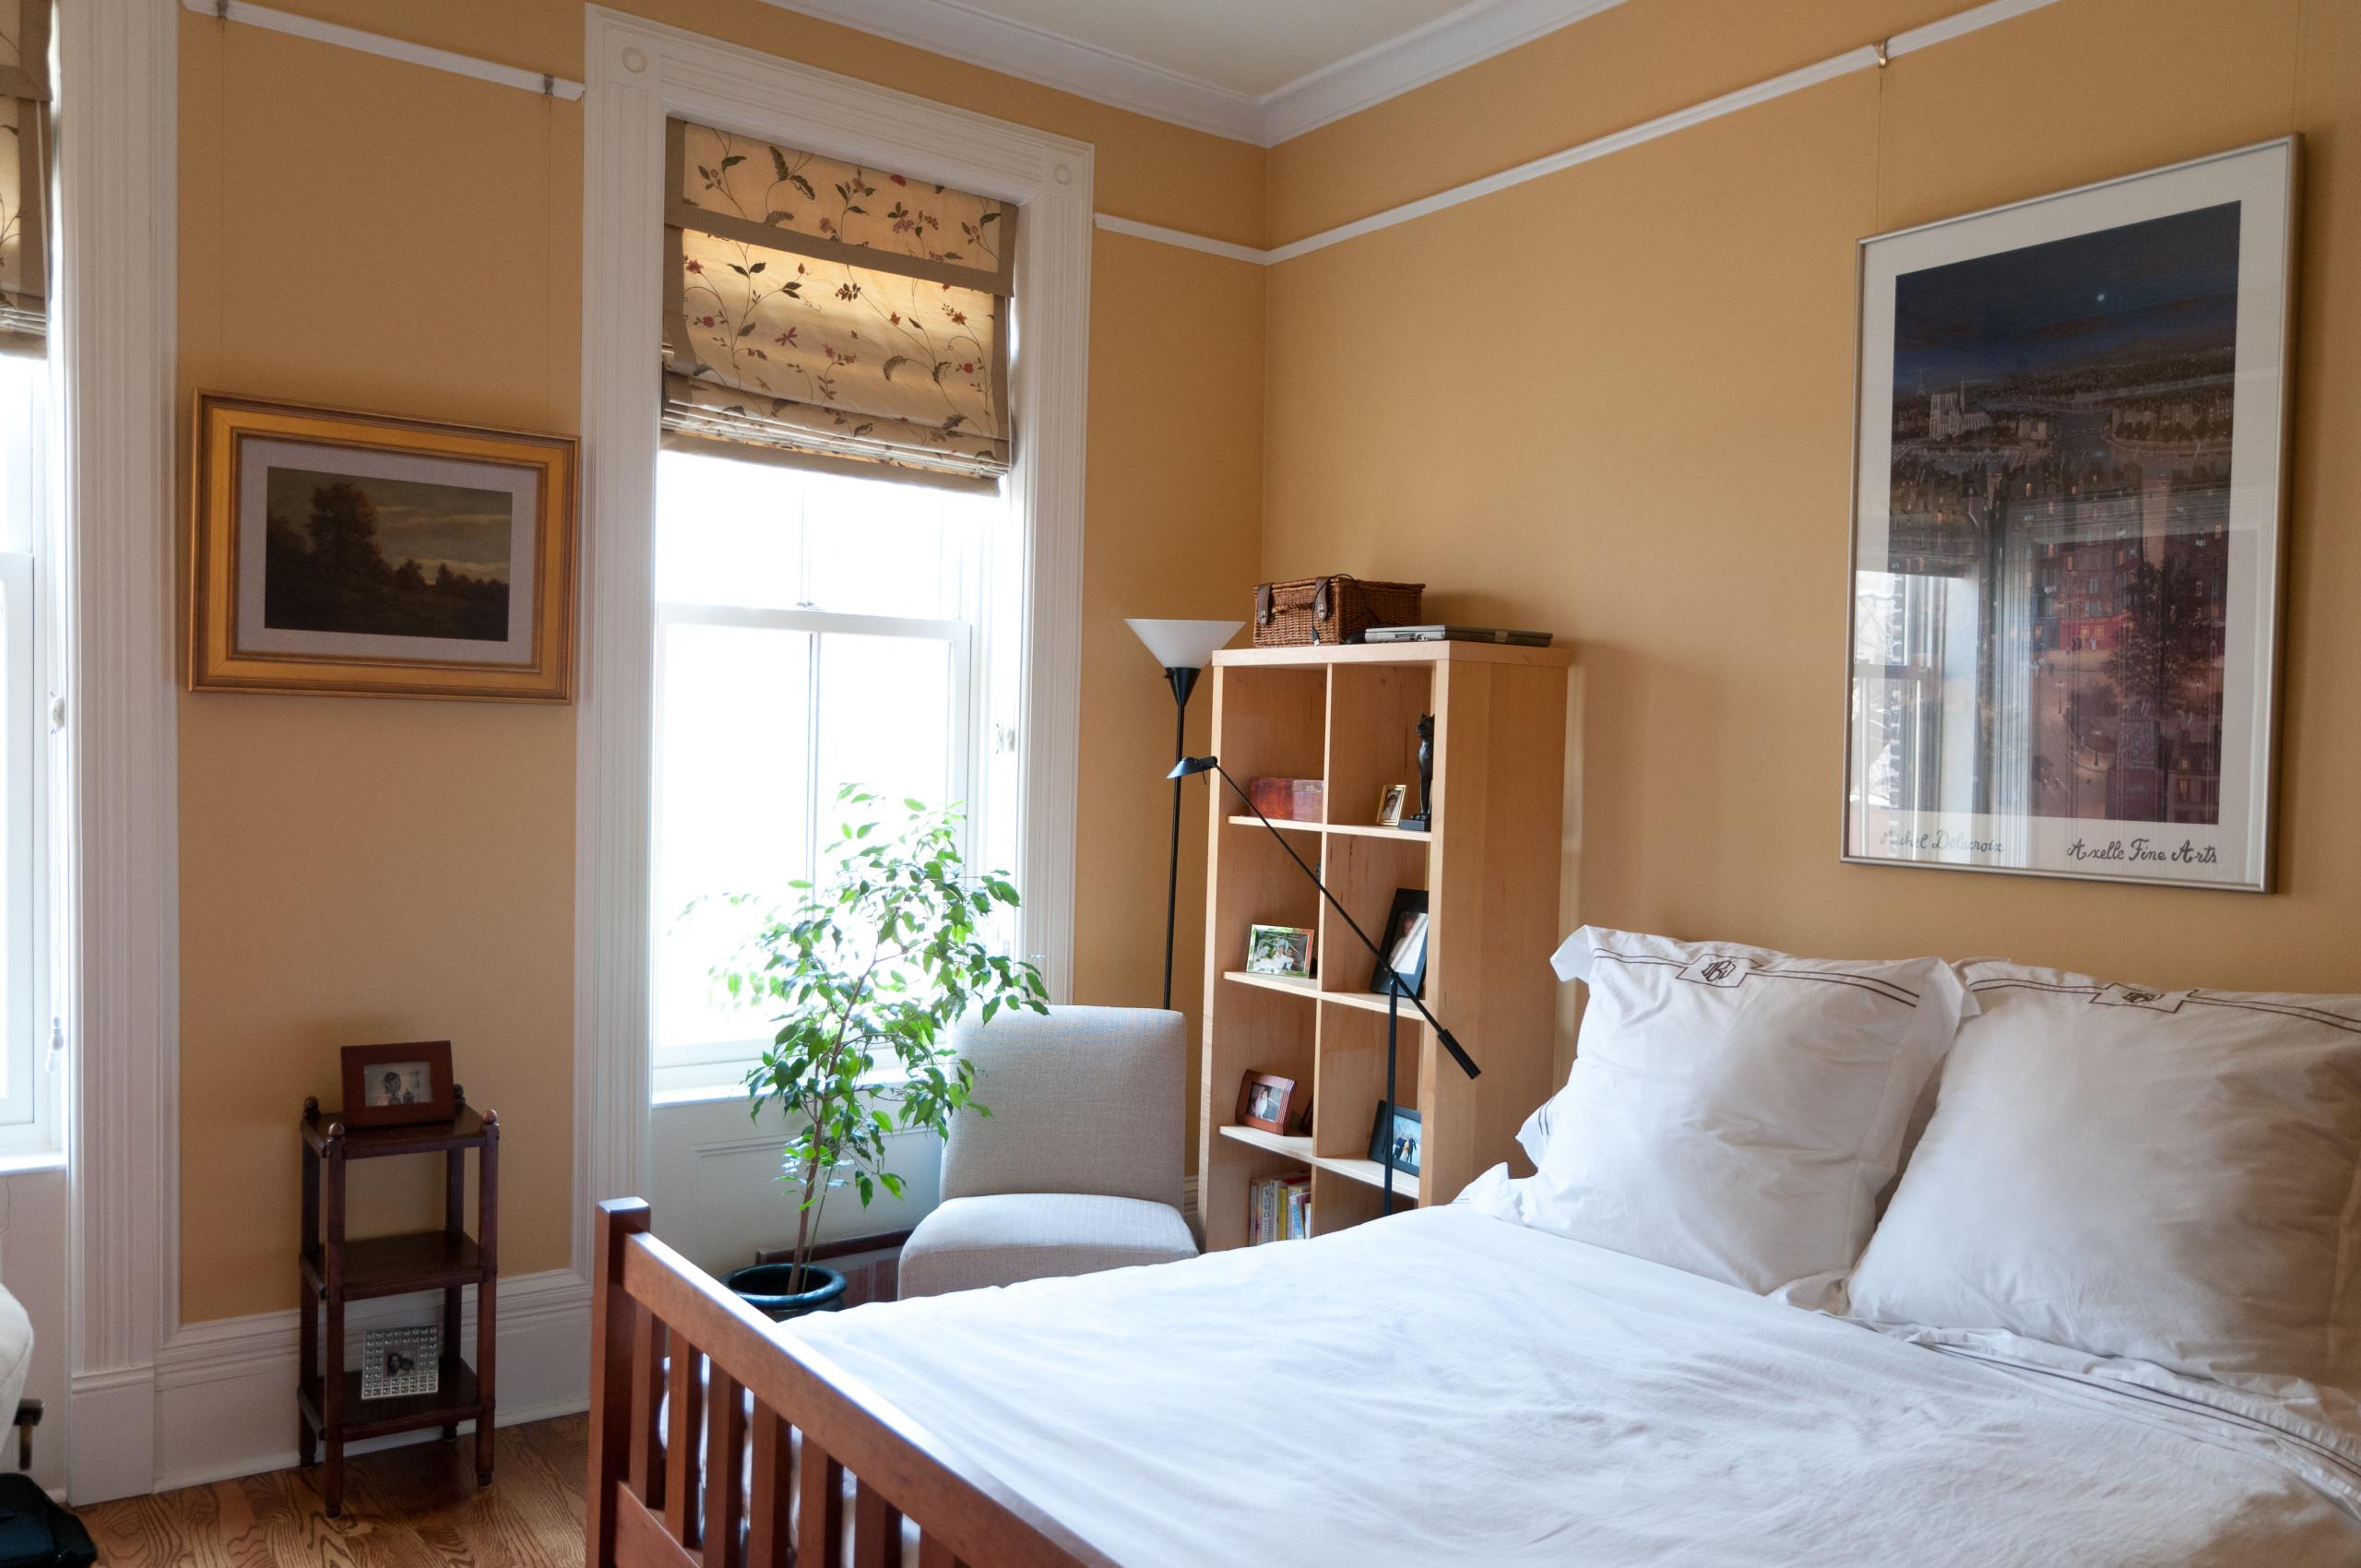 Brownstone Gut Renovation - Restoration Park Avenue - Hoboken, NJ